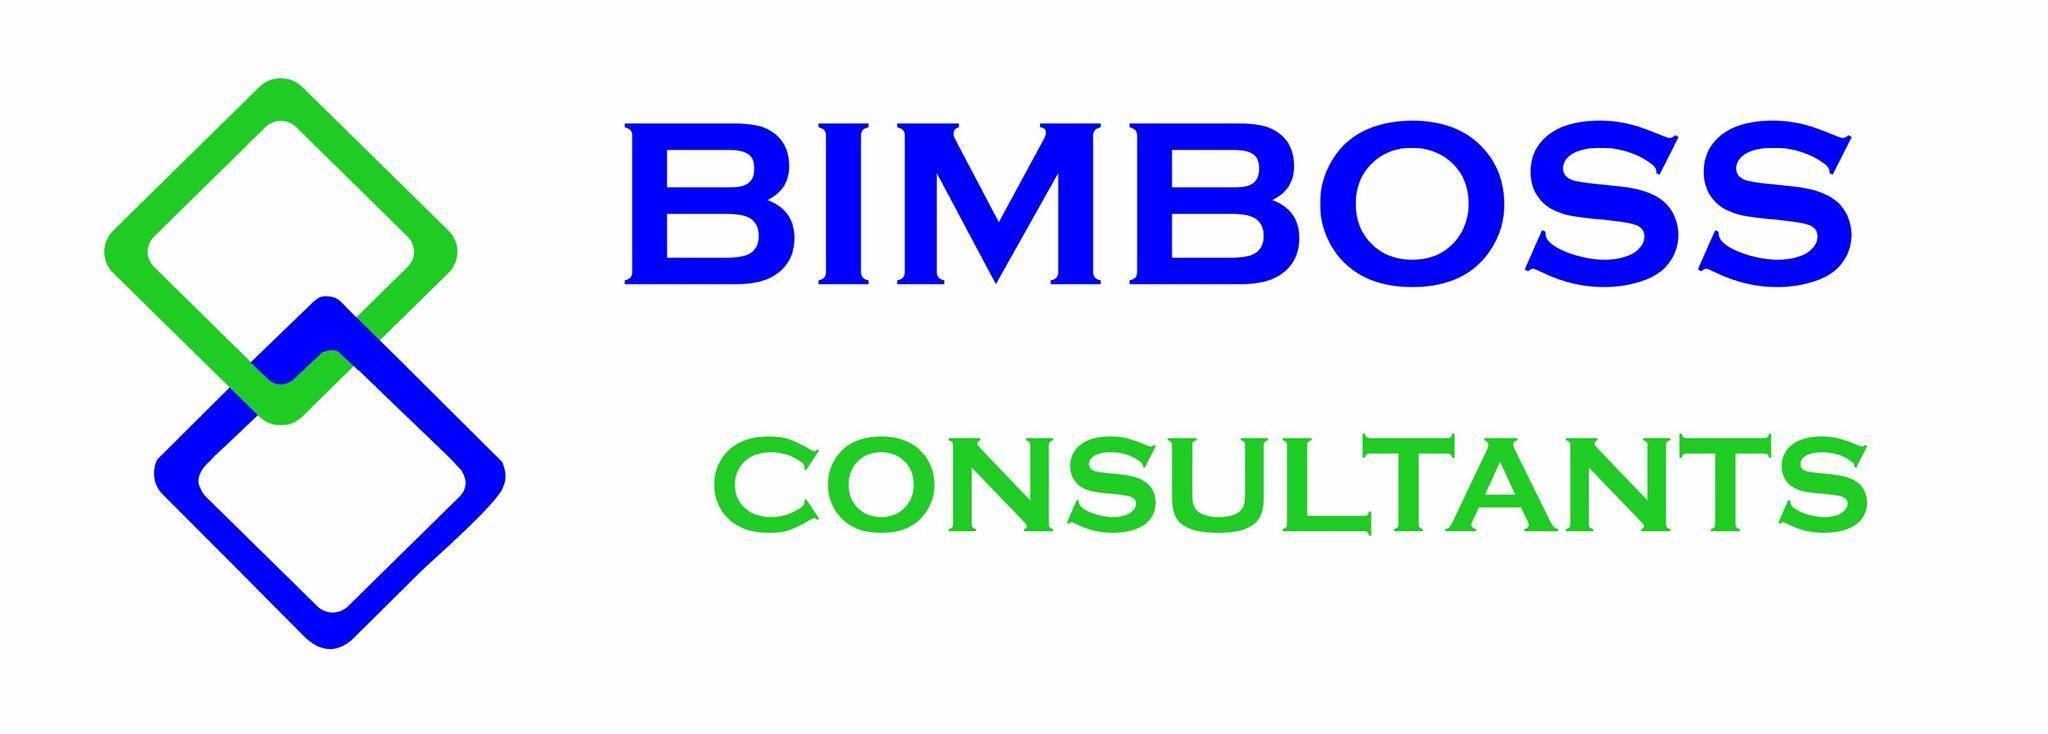 Bimboss Consultants